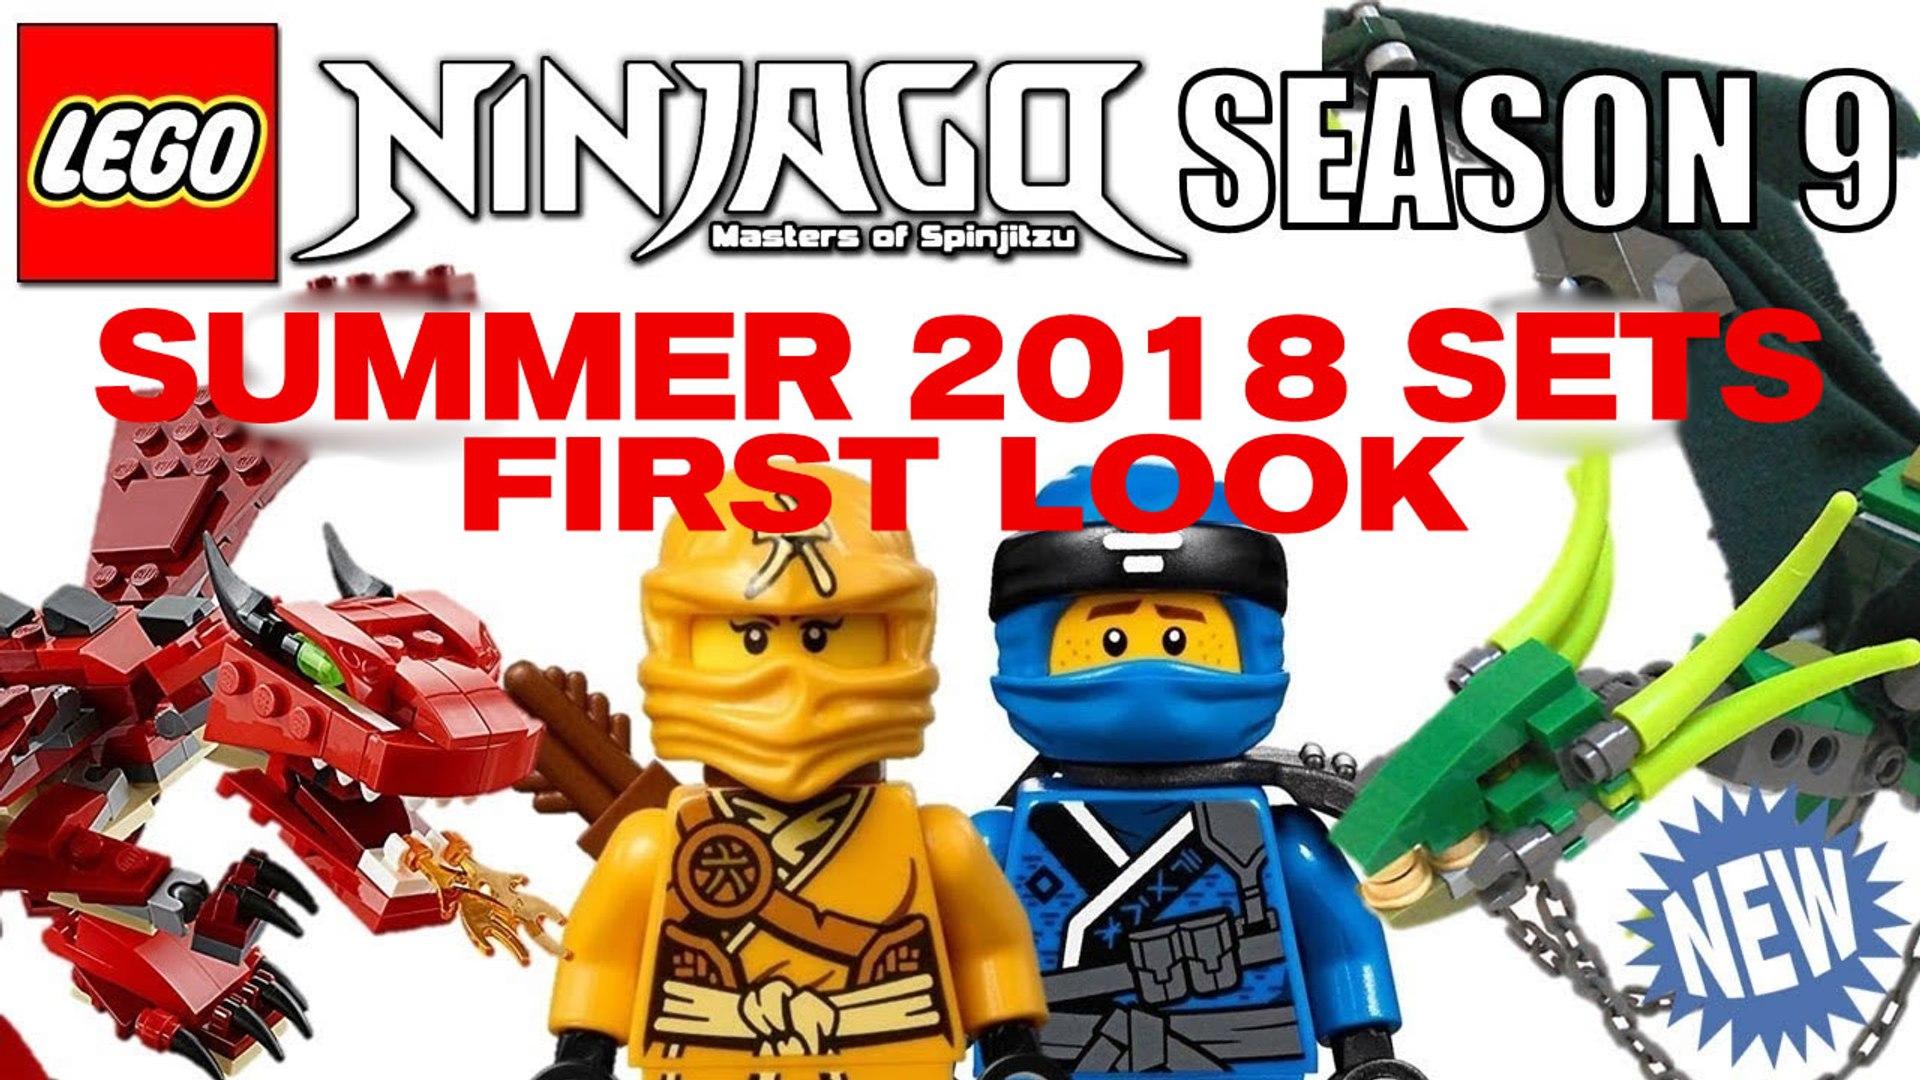 Lego Ninjago 2018 Season 9 Summer Sets First Look Video Dailymotion